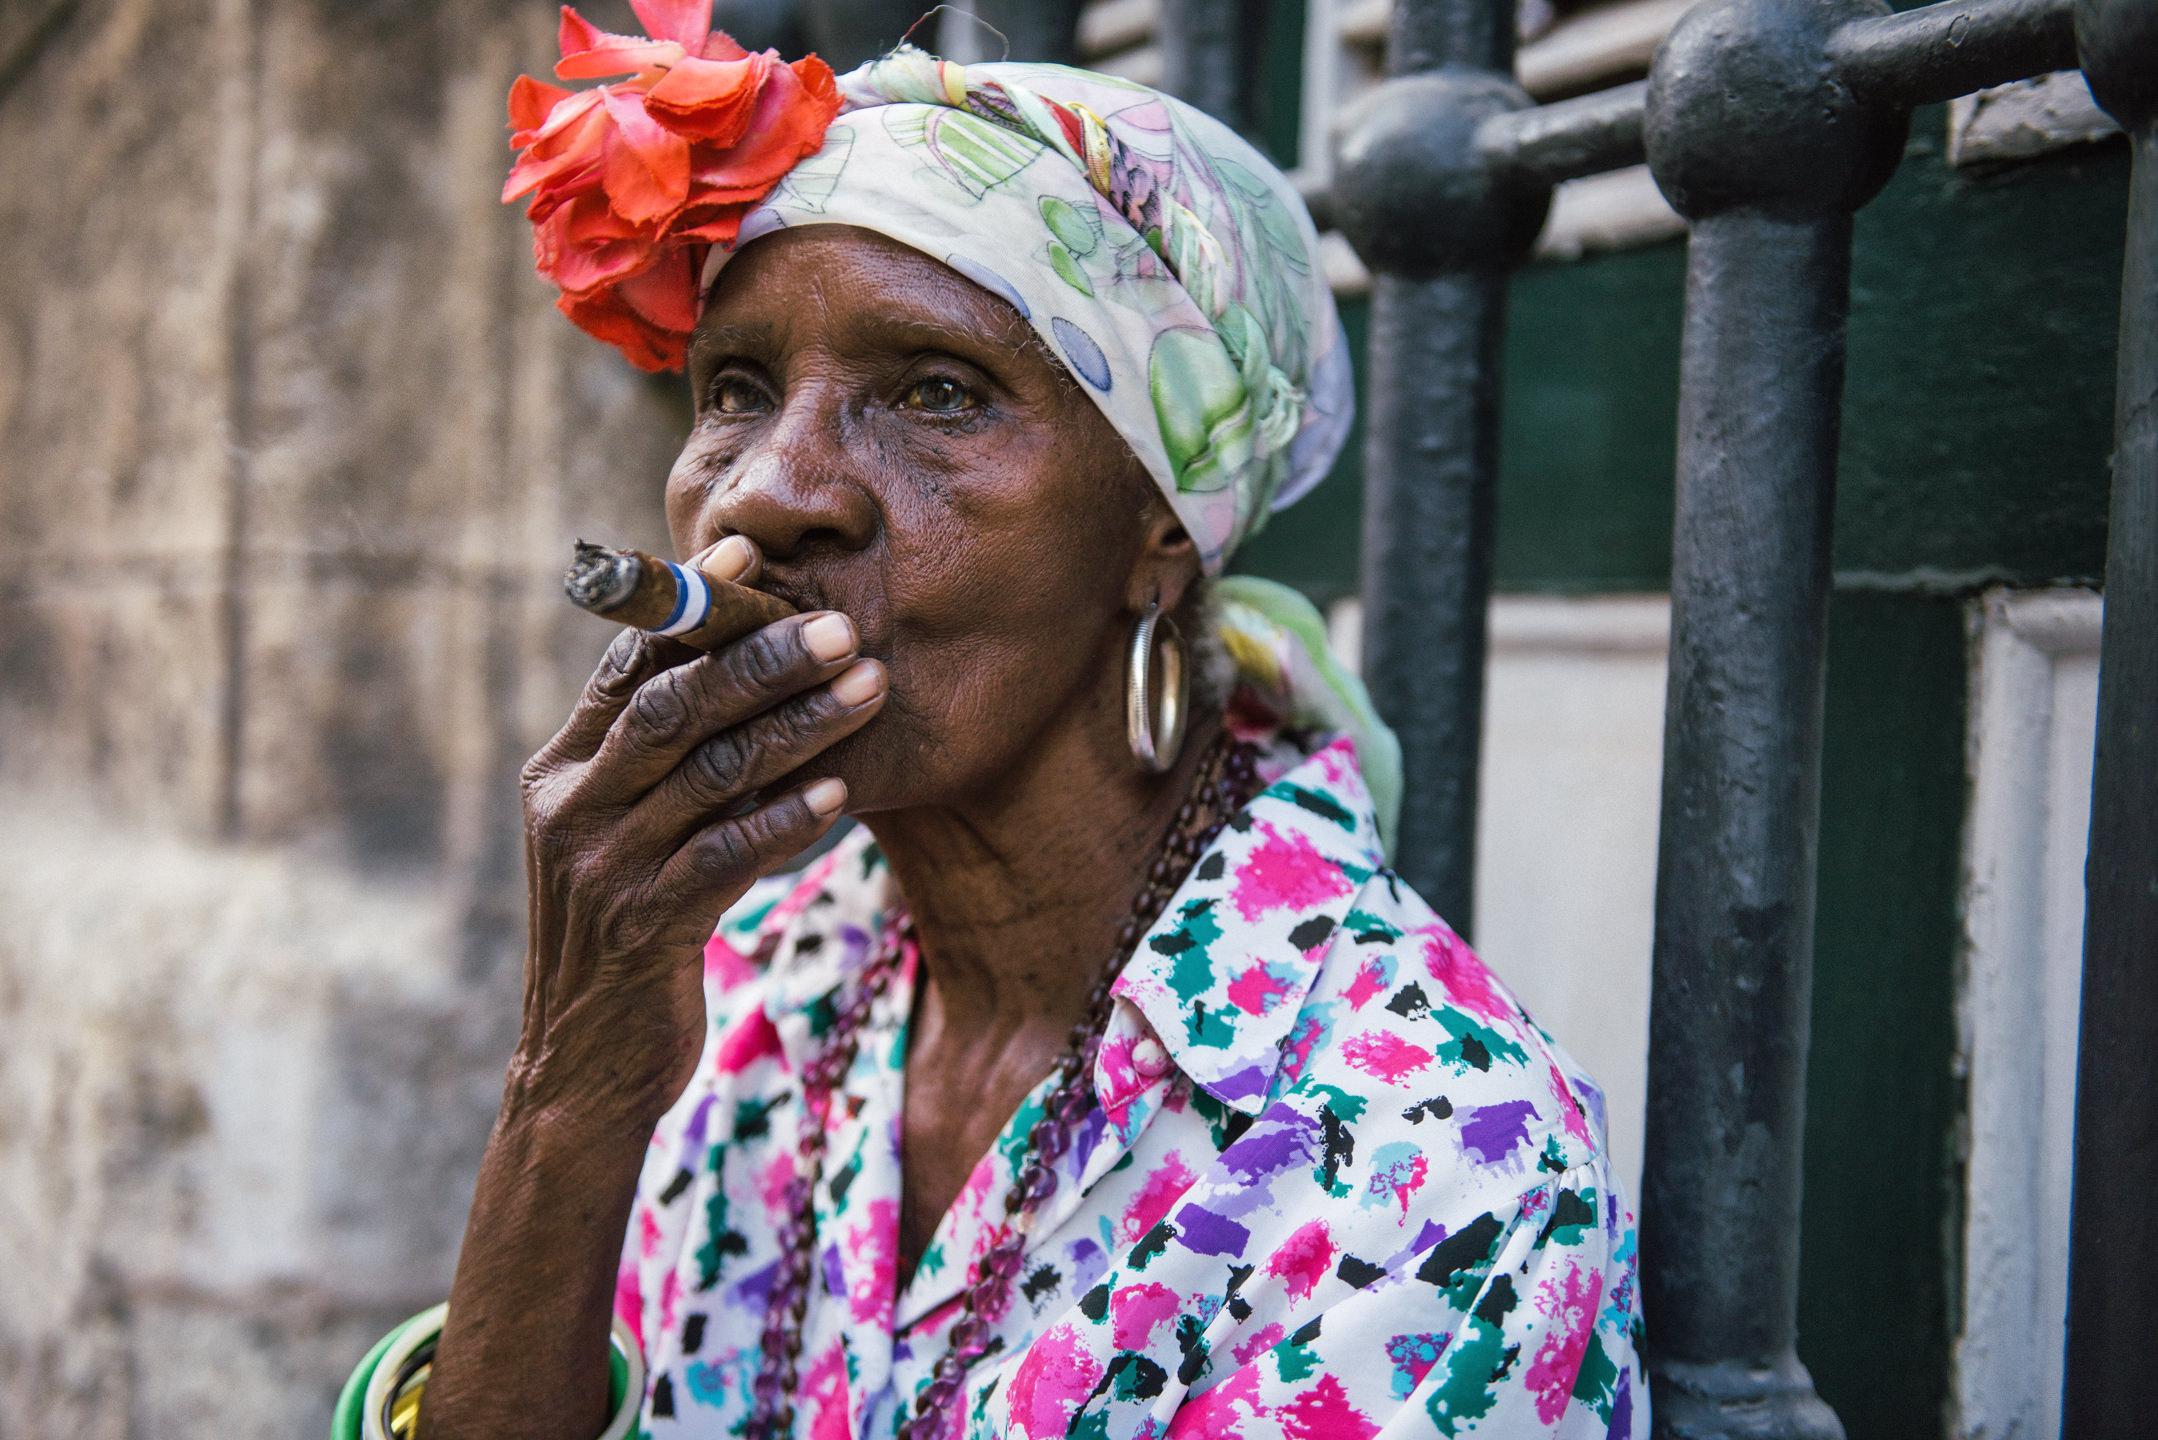 Elliott O'Donovan Photography - Havana Cuba  (2 of 12).jpg